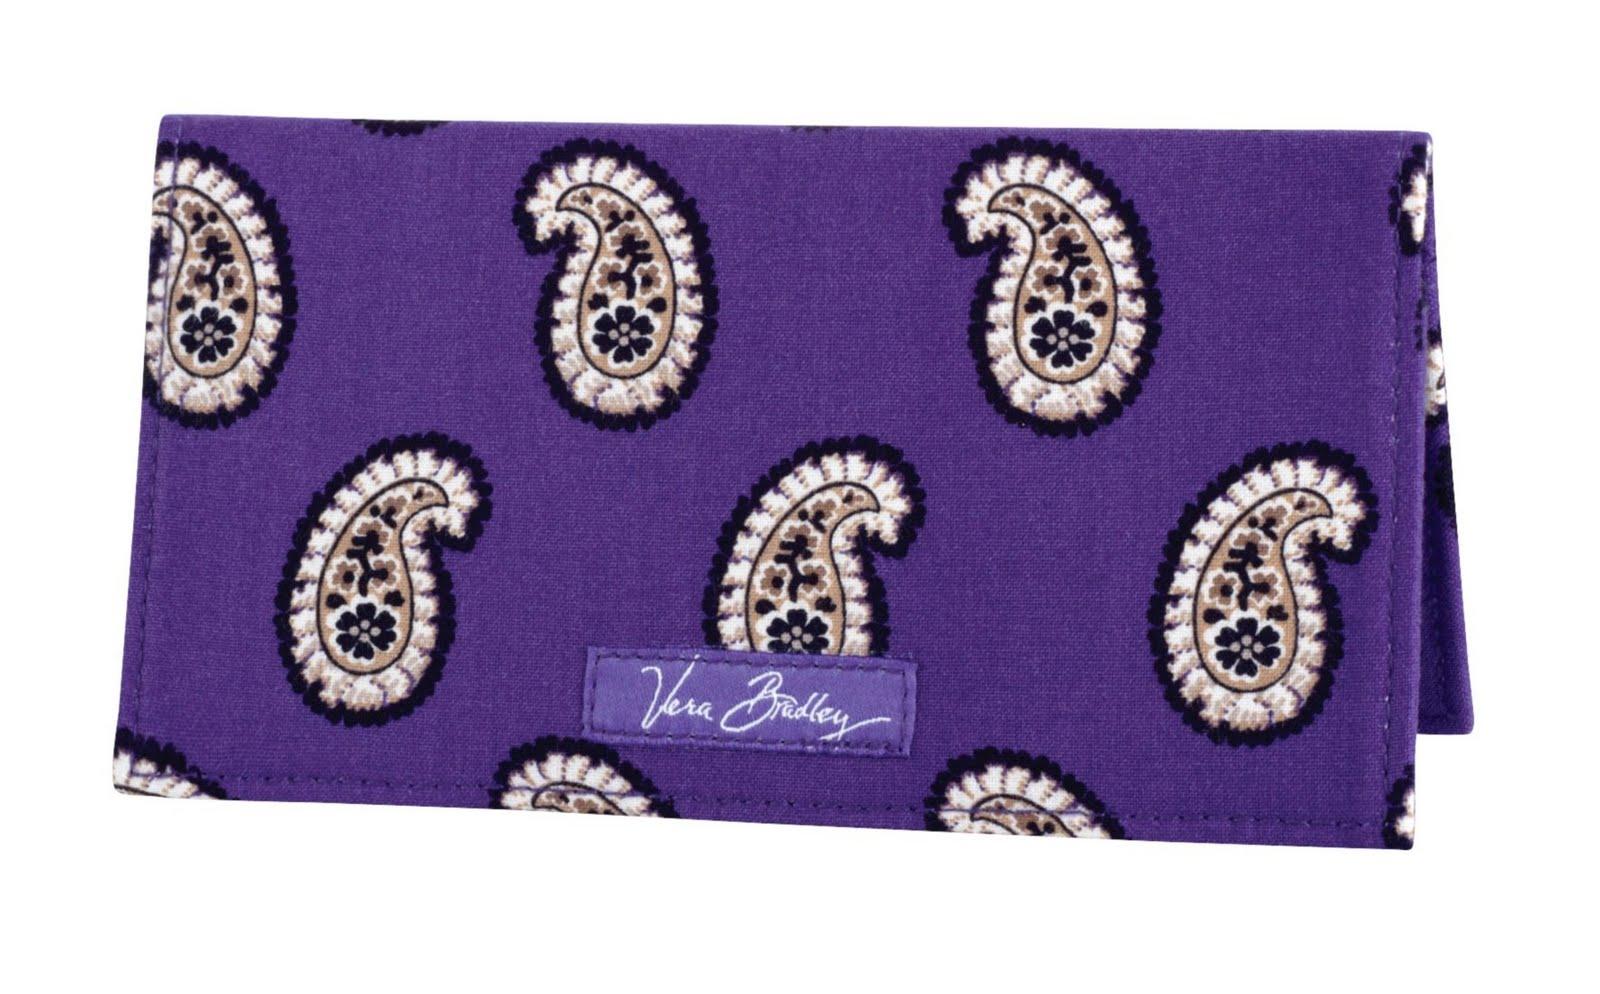 http://1.bp.blogspot.com/_k9DcYbN8HBY/S8Lx7WJzmCI/AAAAAAAAA00/UfJg077IgL4/s1600/Vera+Bradley+Simply+Violet+checkbook+paisley+of+the+week.jpg